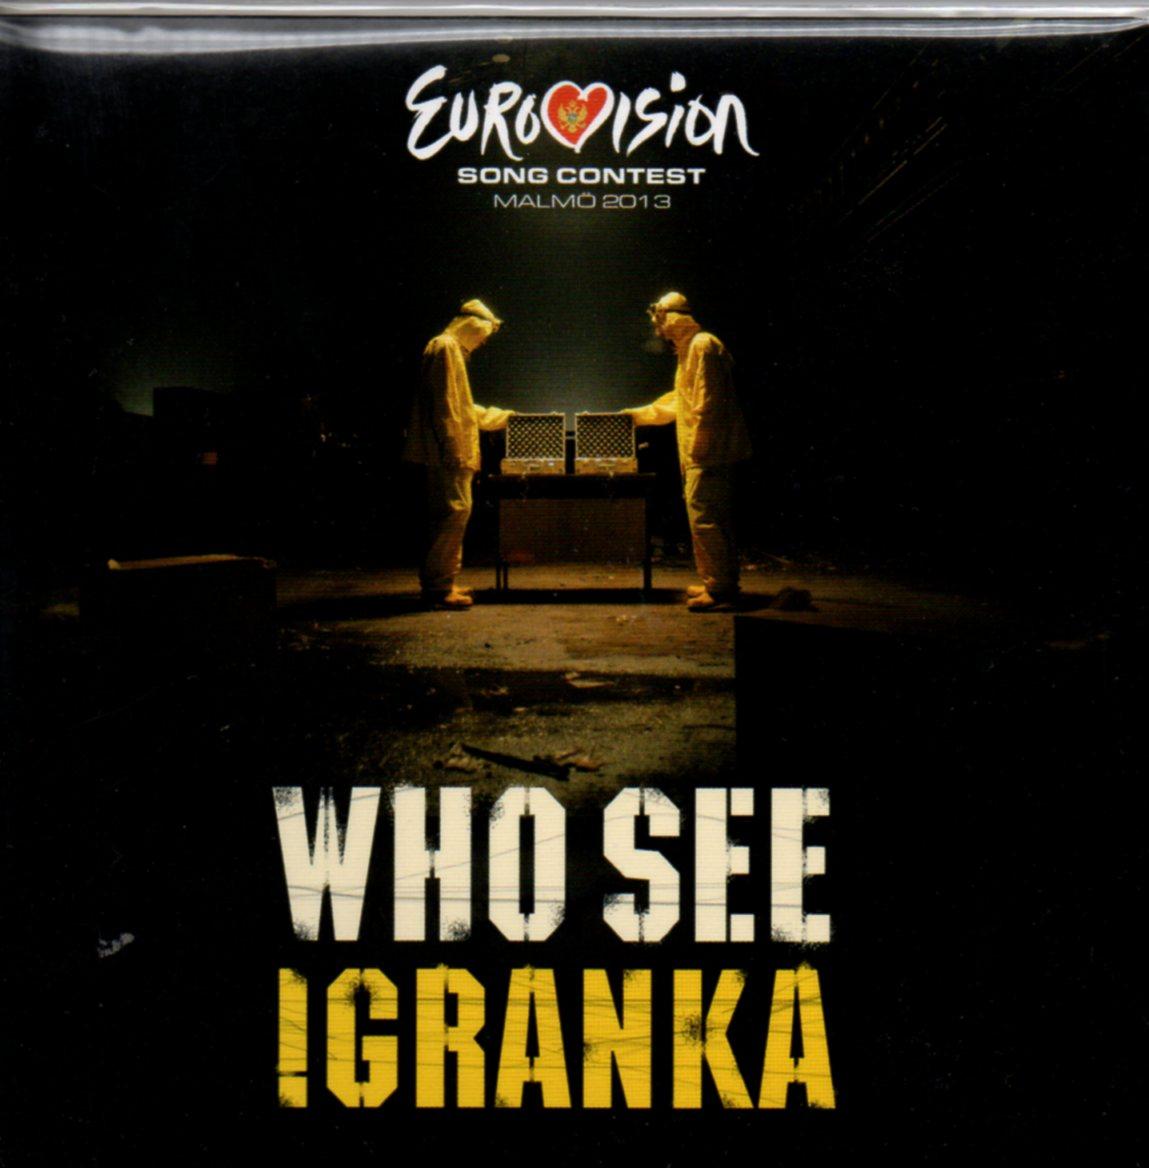 EUROVISION 2013 MONTENEGRO : WHO SEE* FEAT. NINA Ž - Igranka 2-track CARD SLEEVE - CD single